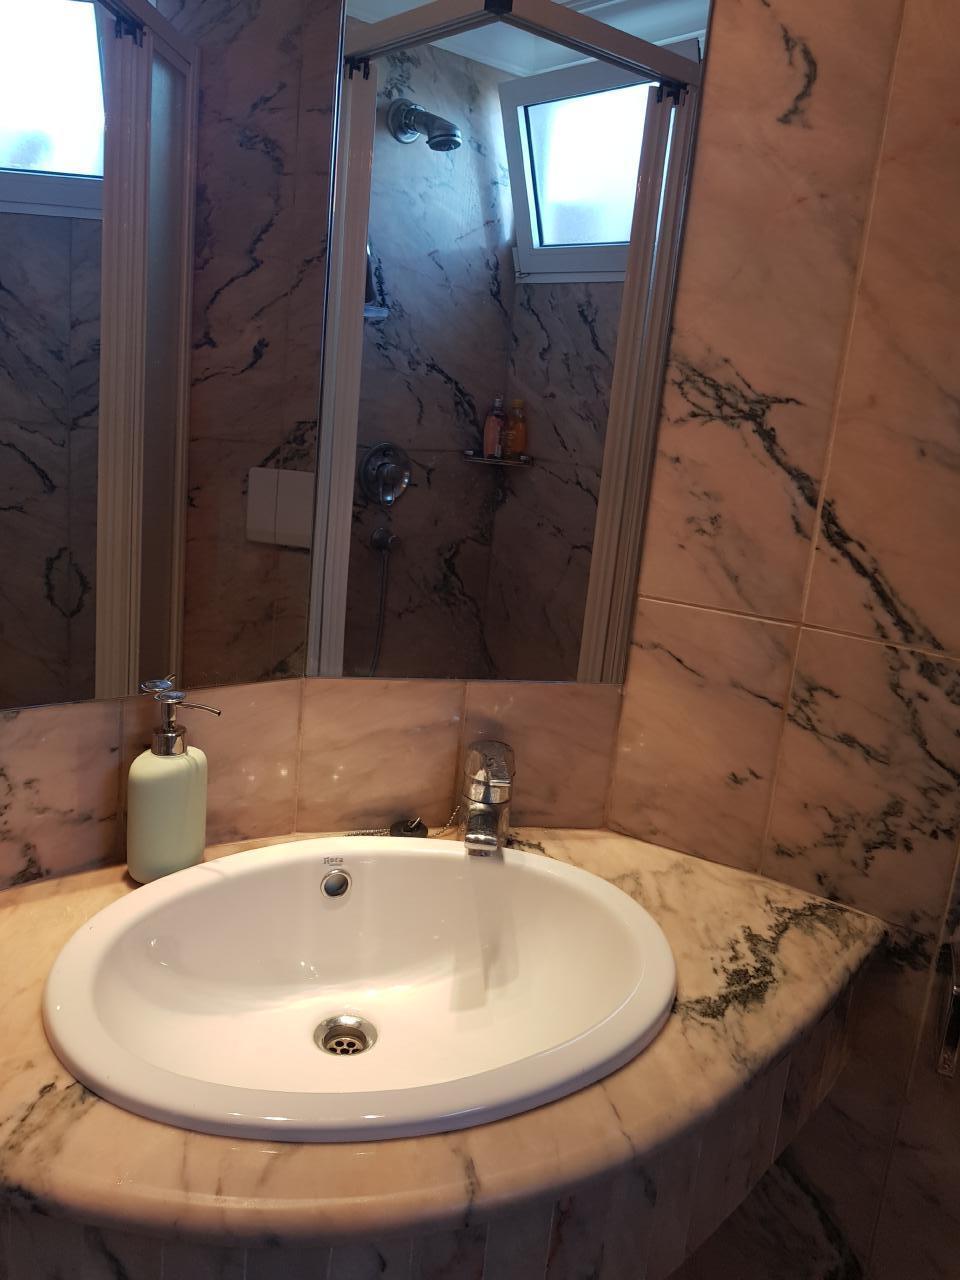 Appartement de vacances Villa Larnia Familien Apartment   * Urlaub für Körper, Geist und Seele * (2529406), El Sauzal, Ténérife, Iles Canaries, Espagne, image 12